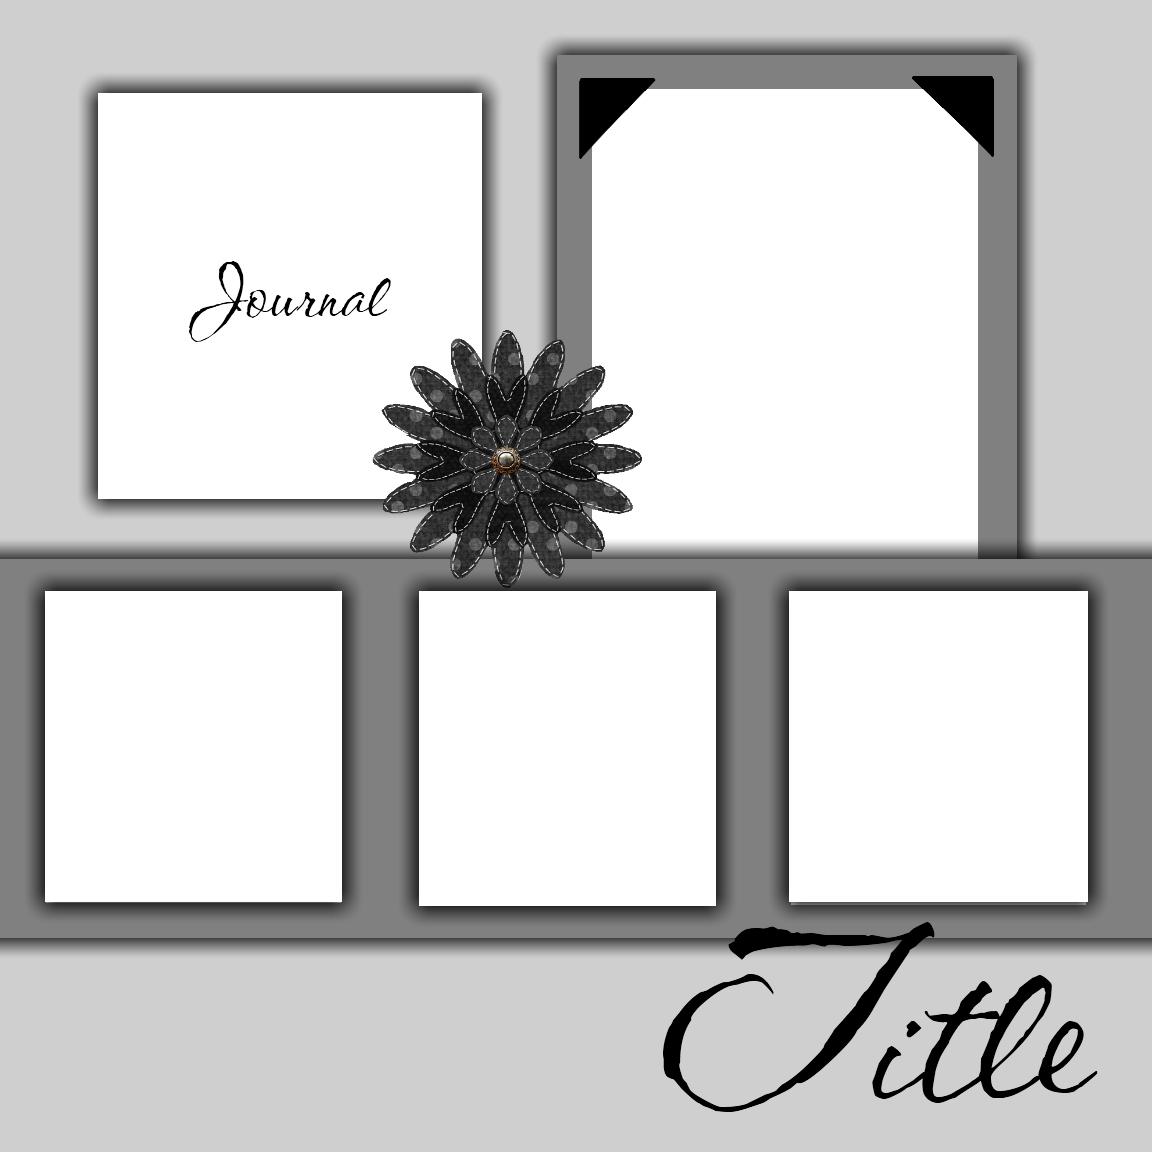 Free Printable Scrapbook Layout Templates | Free Scrapbook Templates - Free Printable Scrapbook Templates